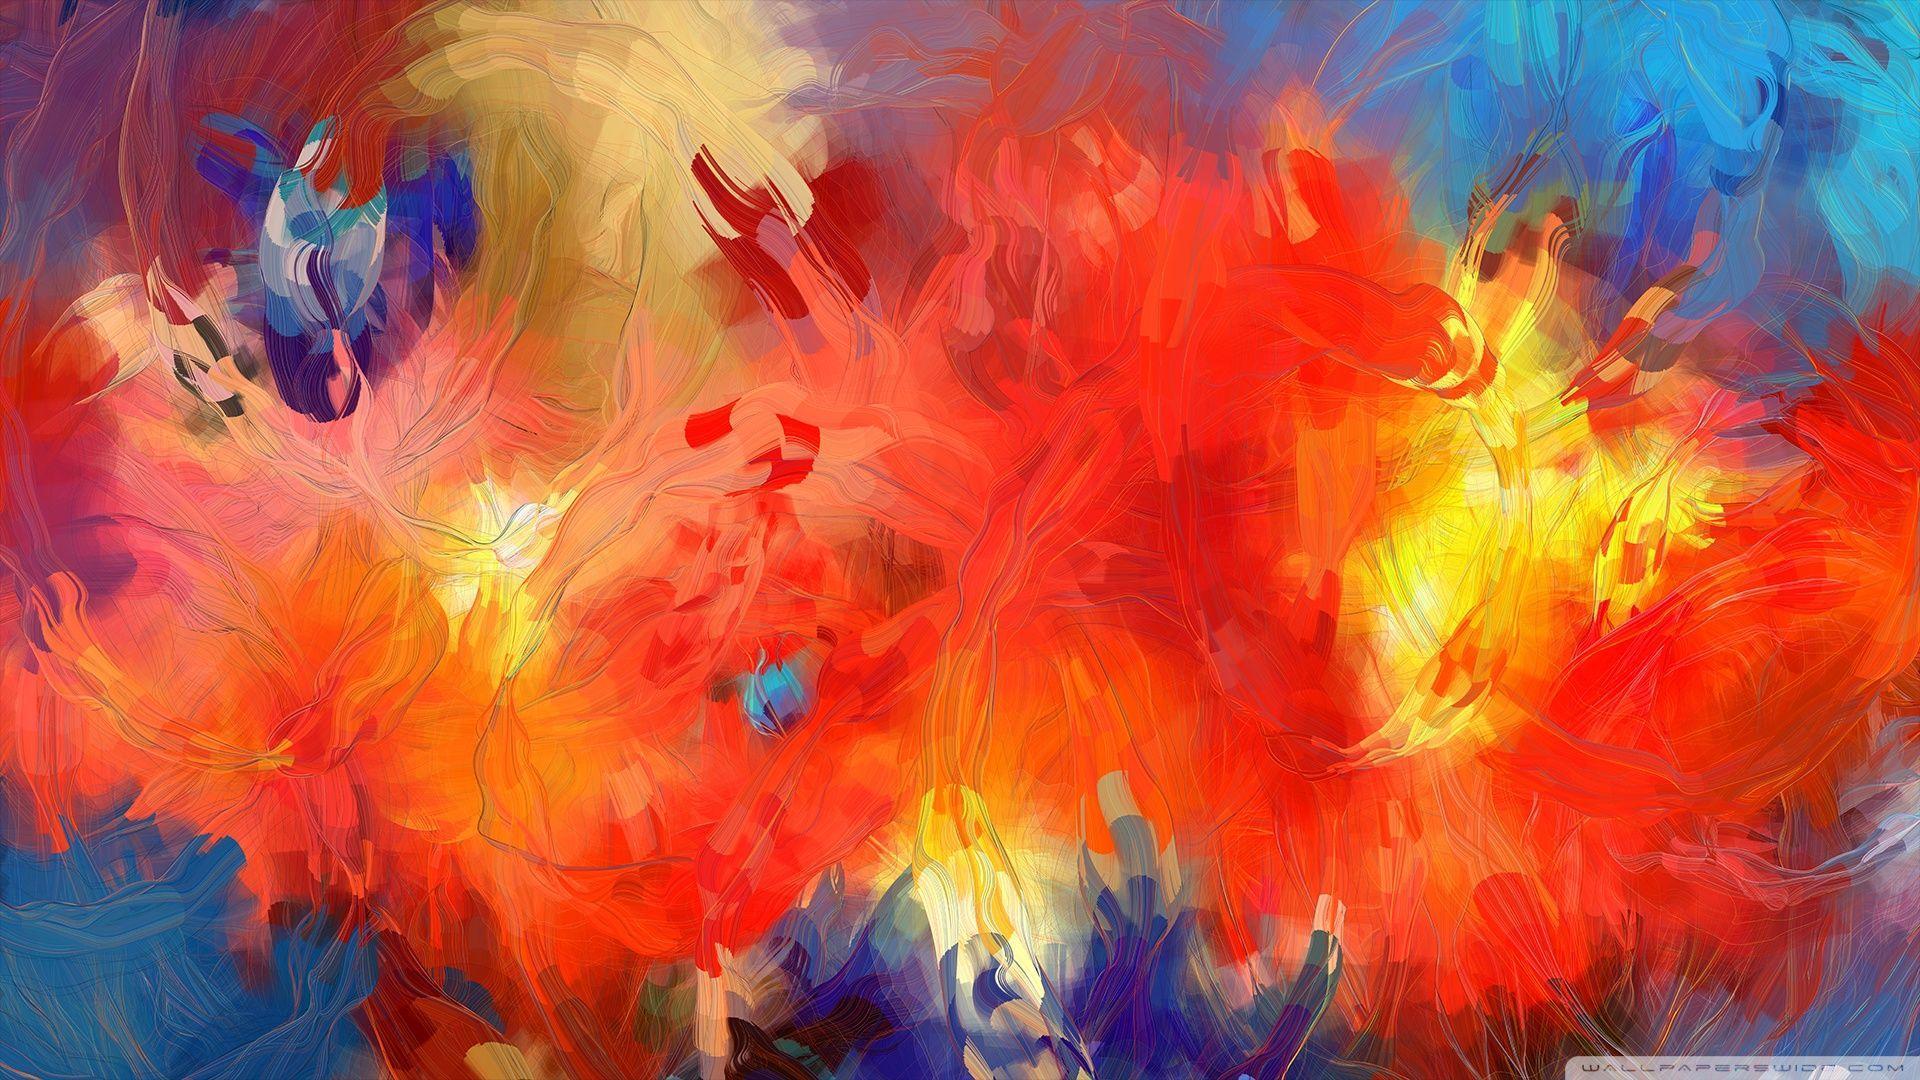 Free Image Moder Art Paintings